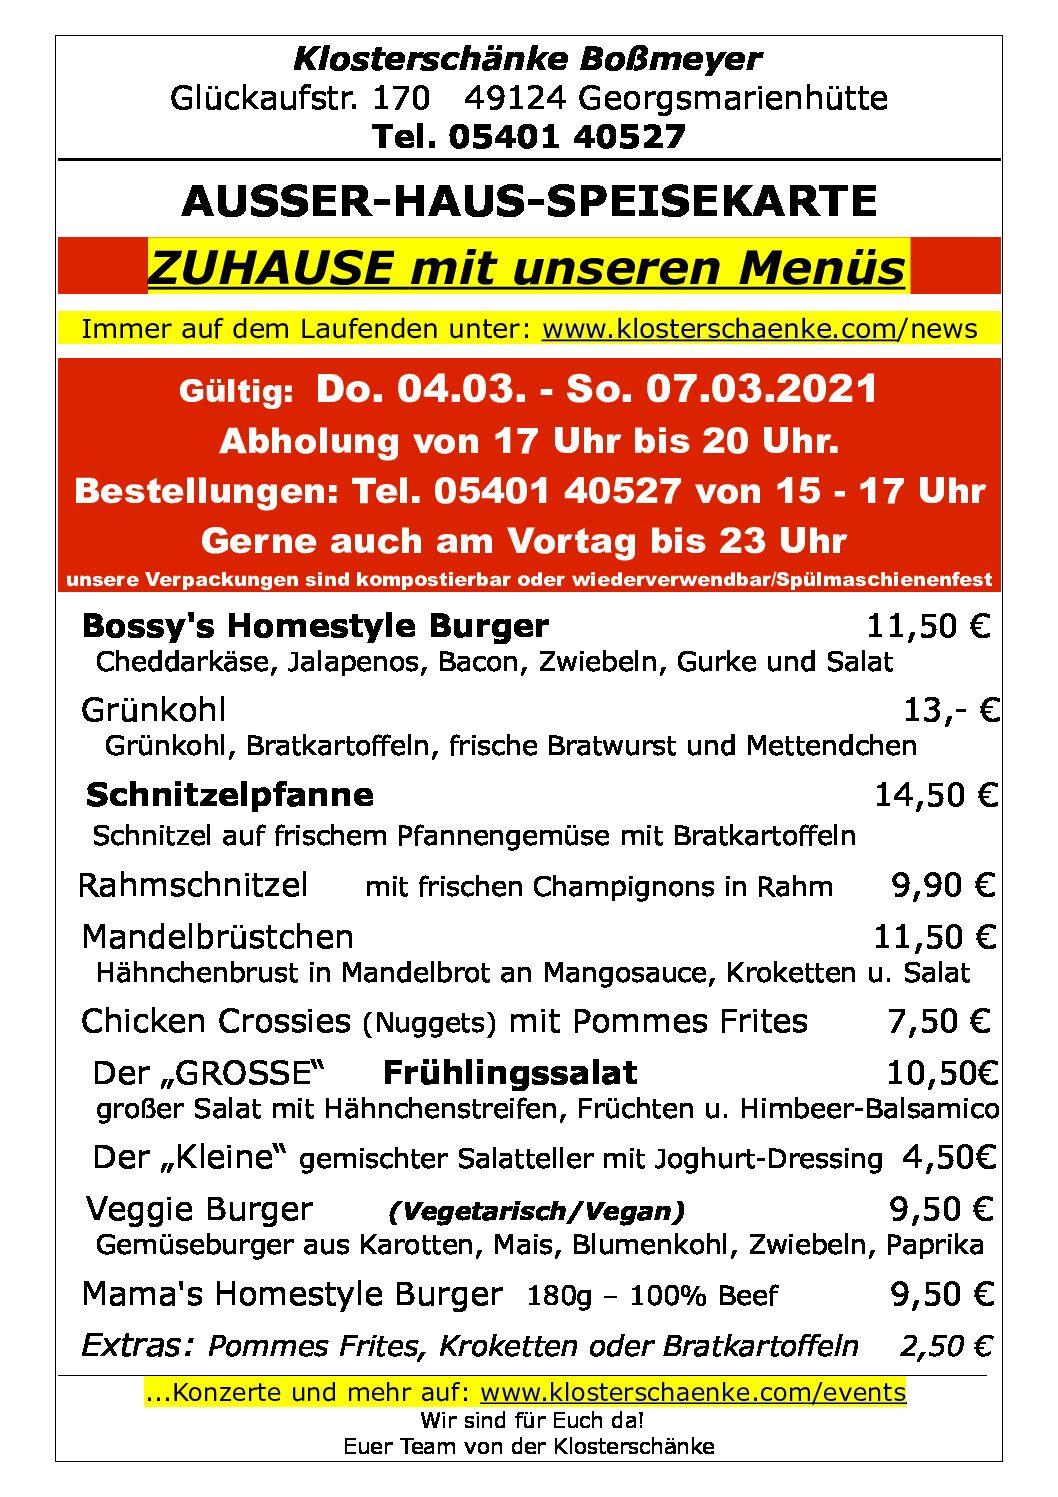 AUSSER-HAUS-SPEISEKARTE 04.03. – 07.03.2021